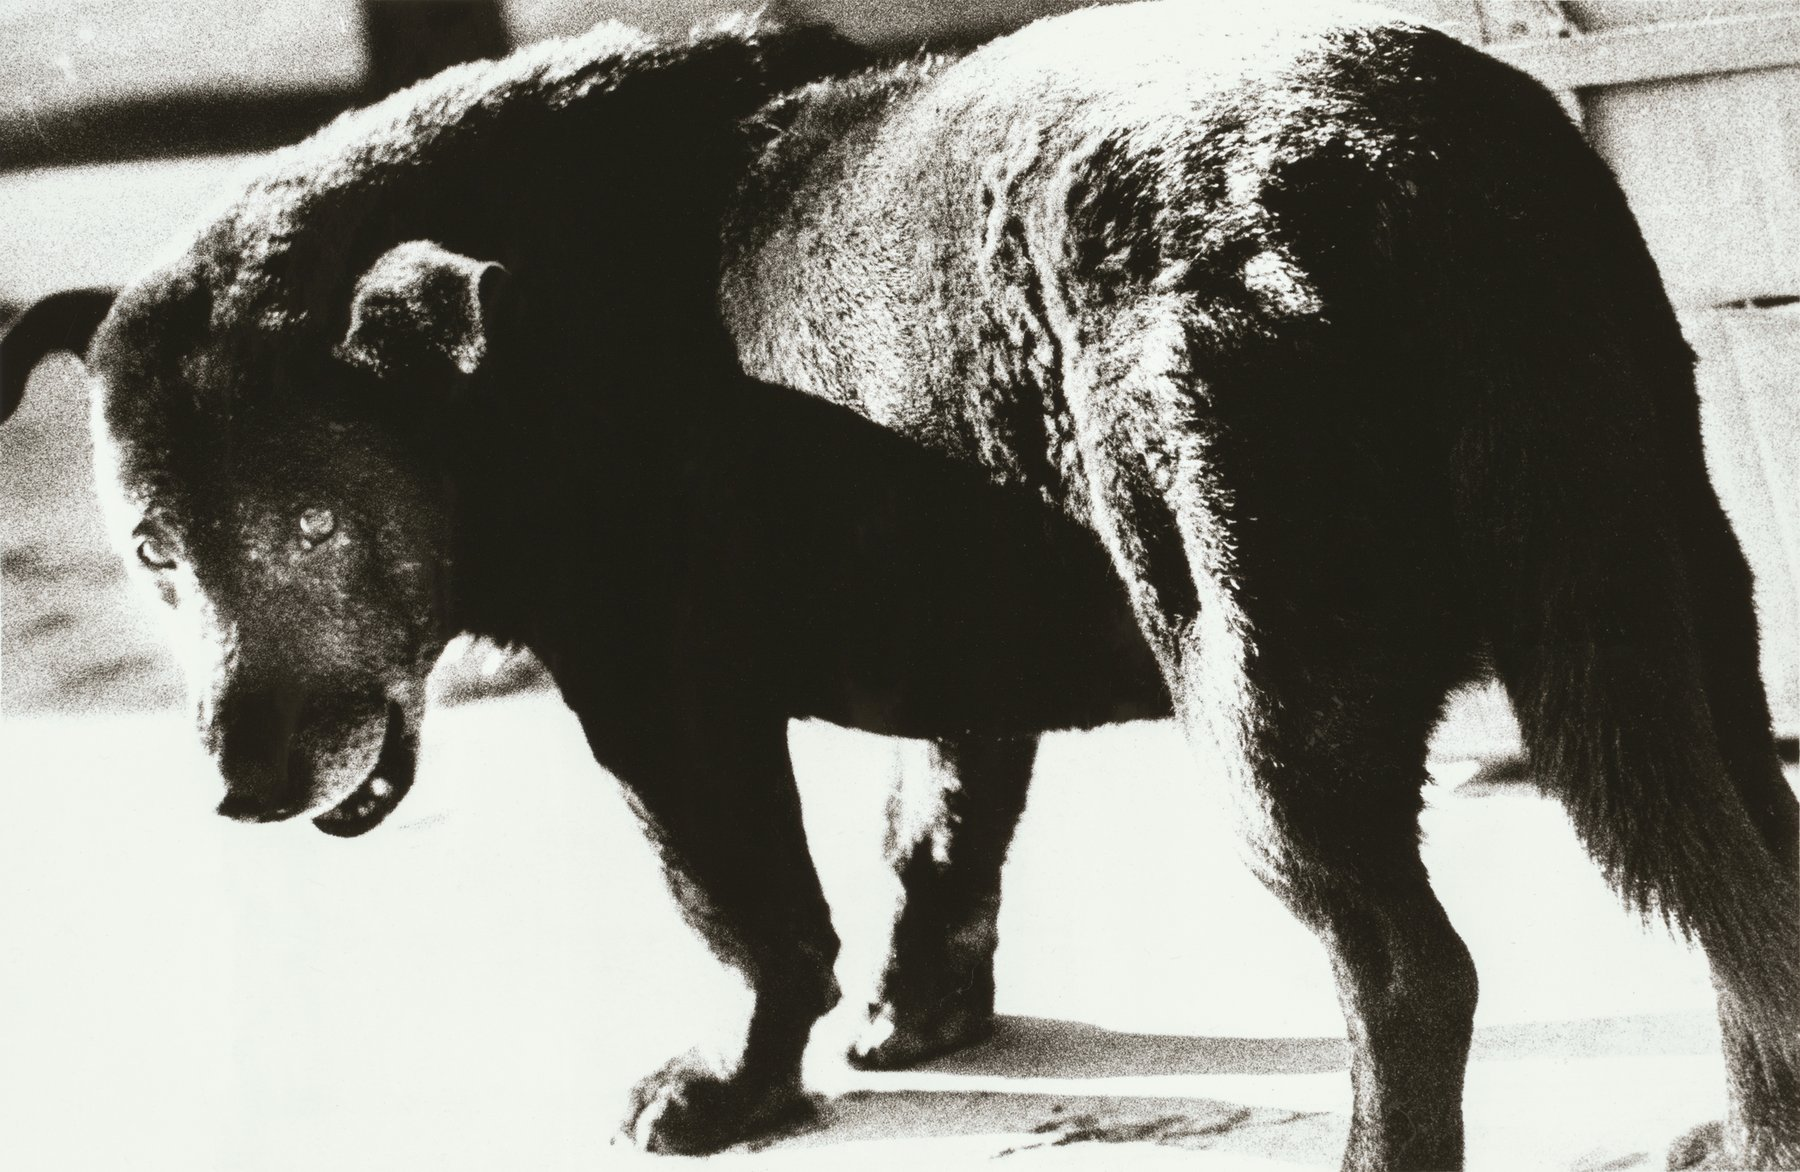 Black and white photograph of a stray dog, Daido Moriyama